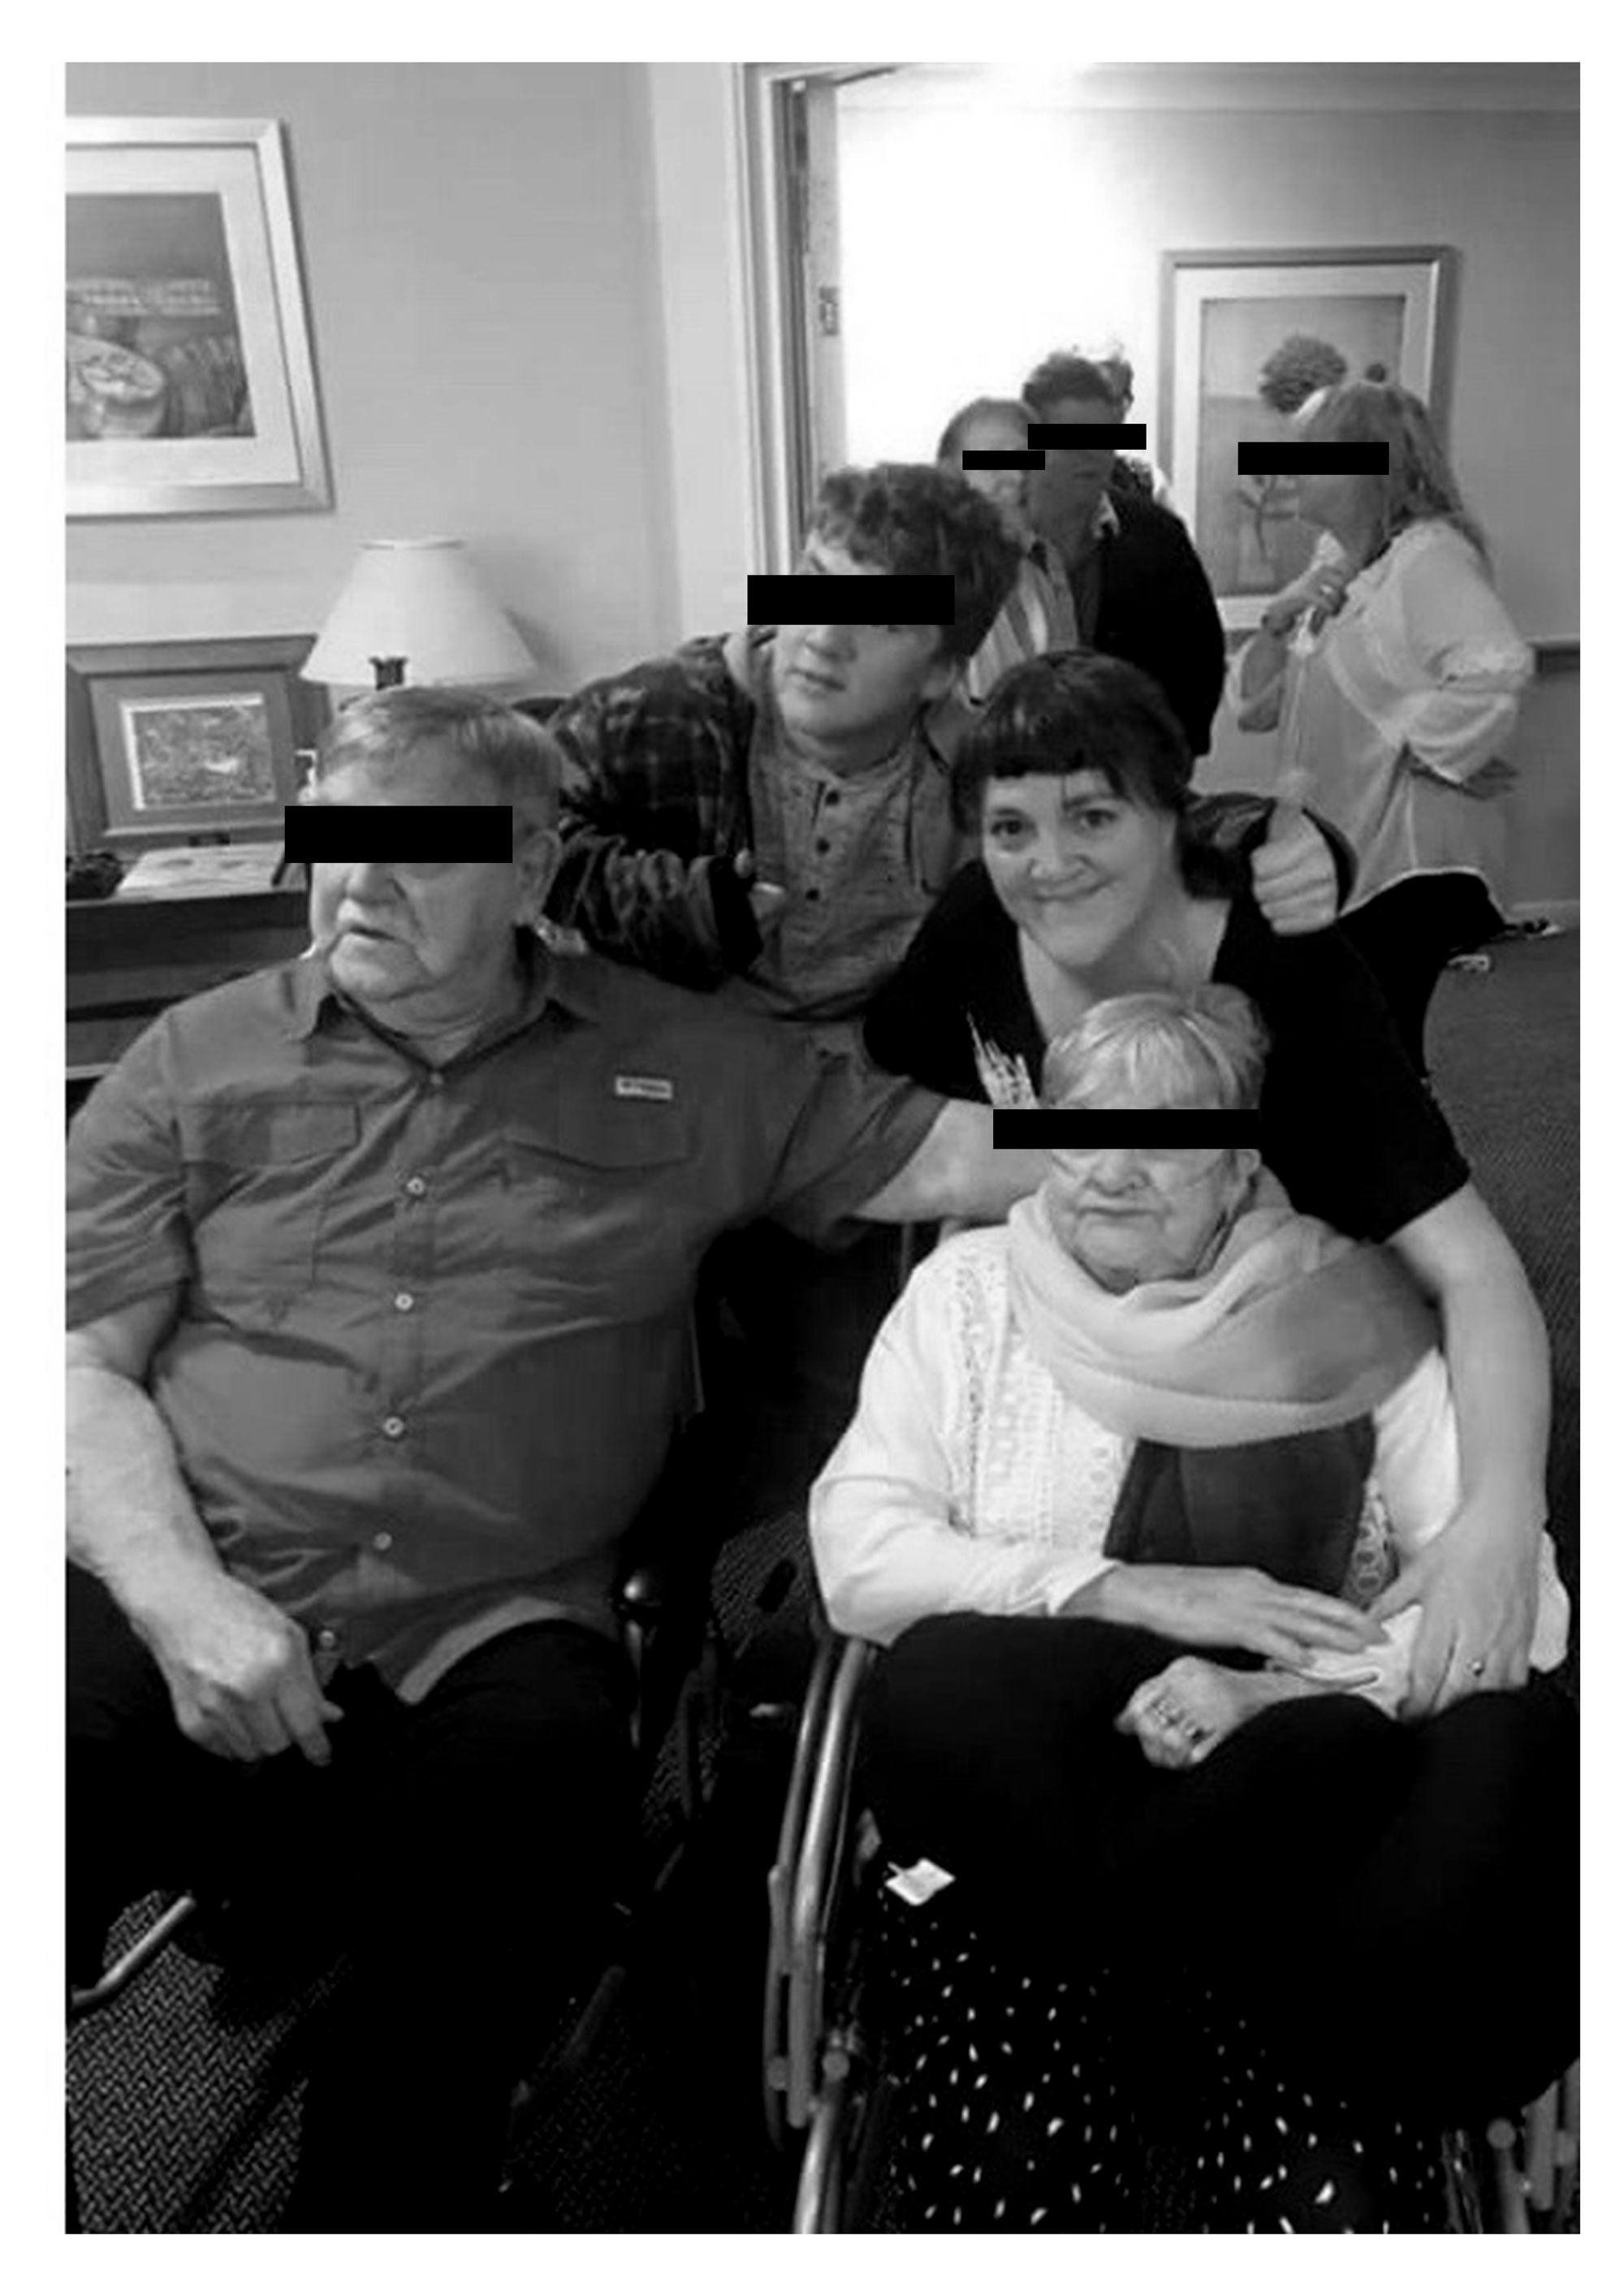 Mum's 80th birthday celebration, 26 August 2017